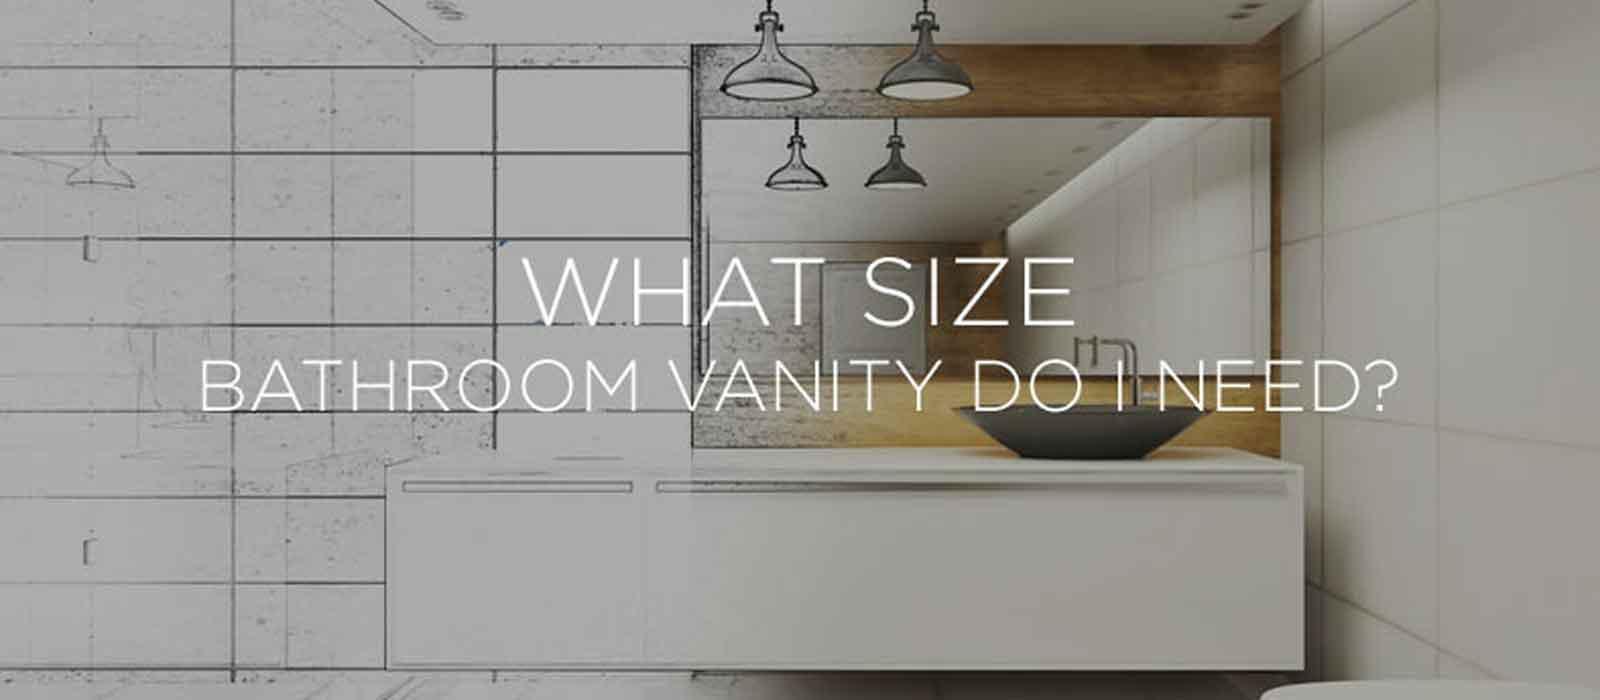 Size of Bathroom Vanity